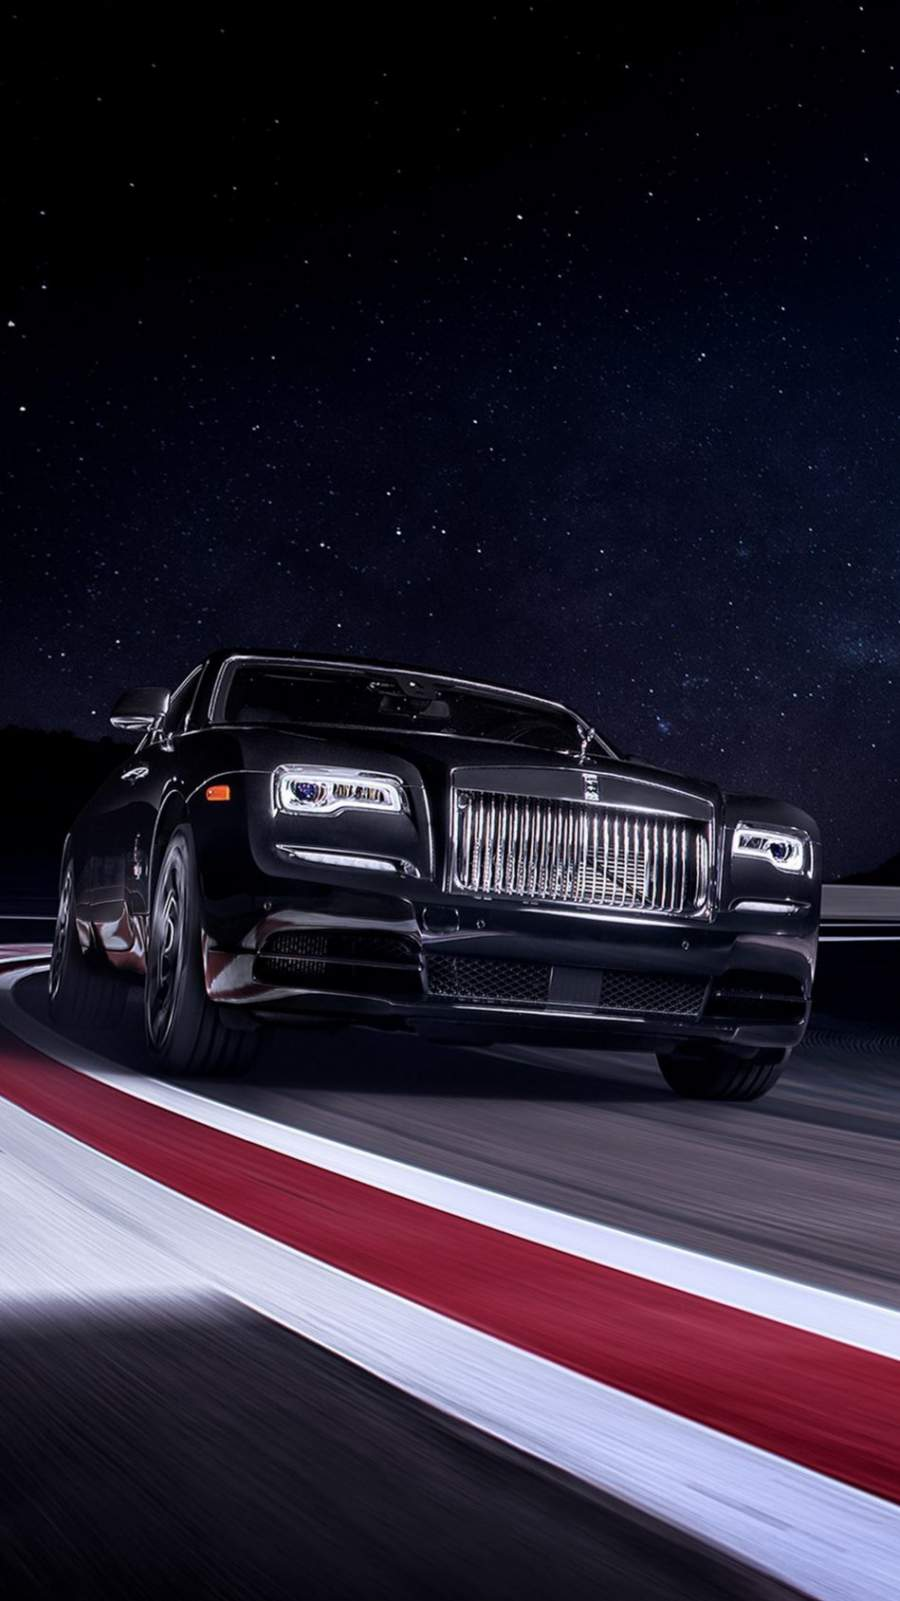 Rolls-Royce-Black-On-Race-Track-iPhone-Wallpaper - iPhone ...